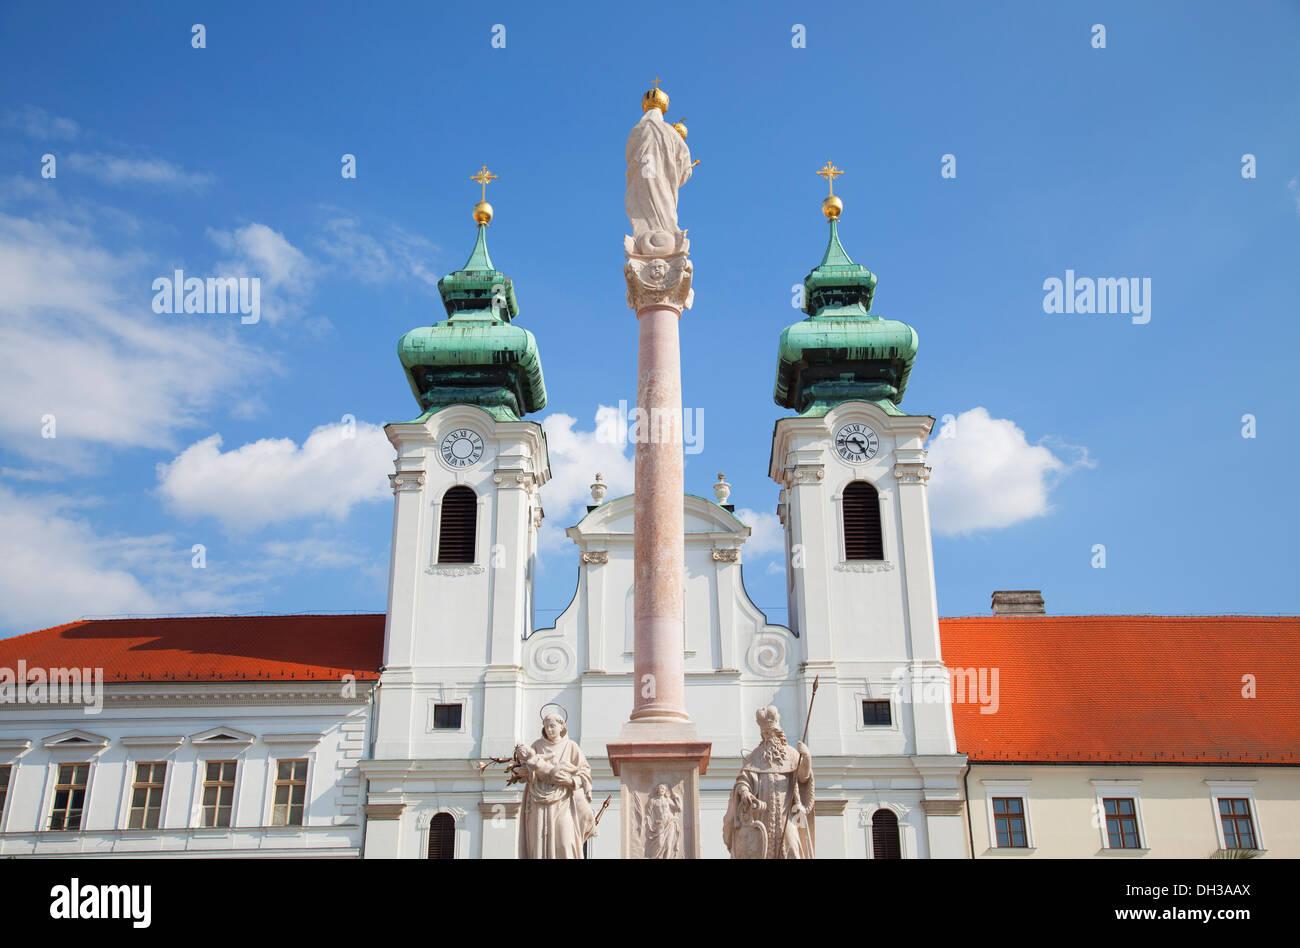 Church of St Ignatius Loyola and Trinity Column in Szechenyi Square, Gyor, Western Transdanubia, Hungary - Stock Image